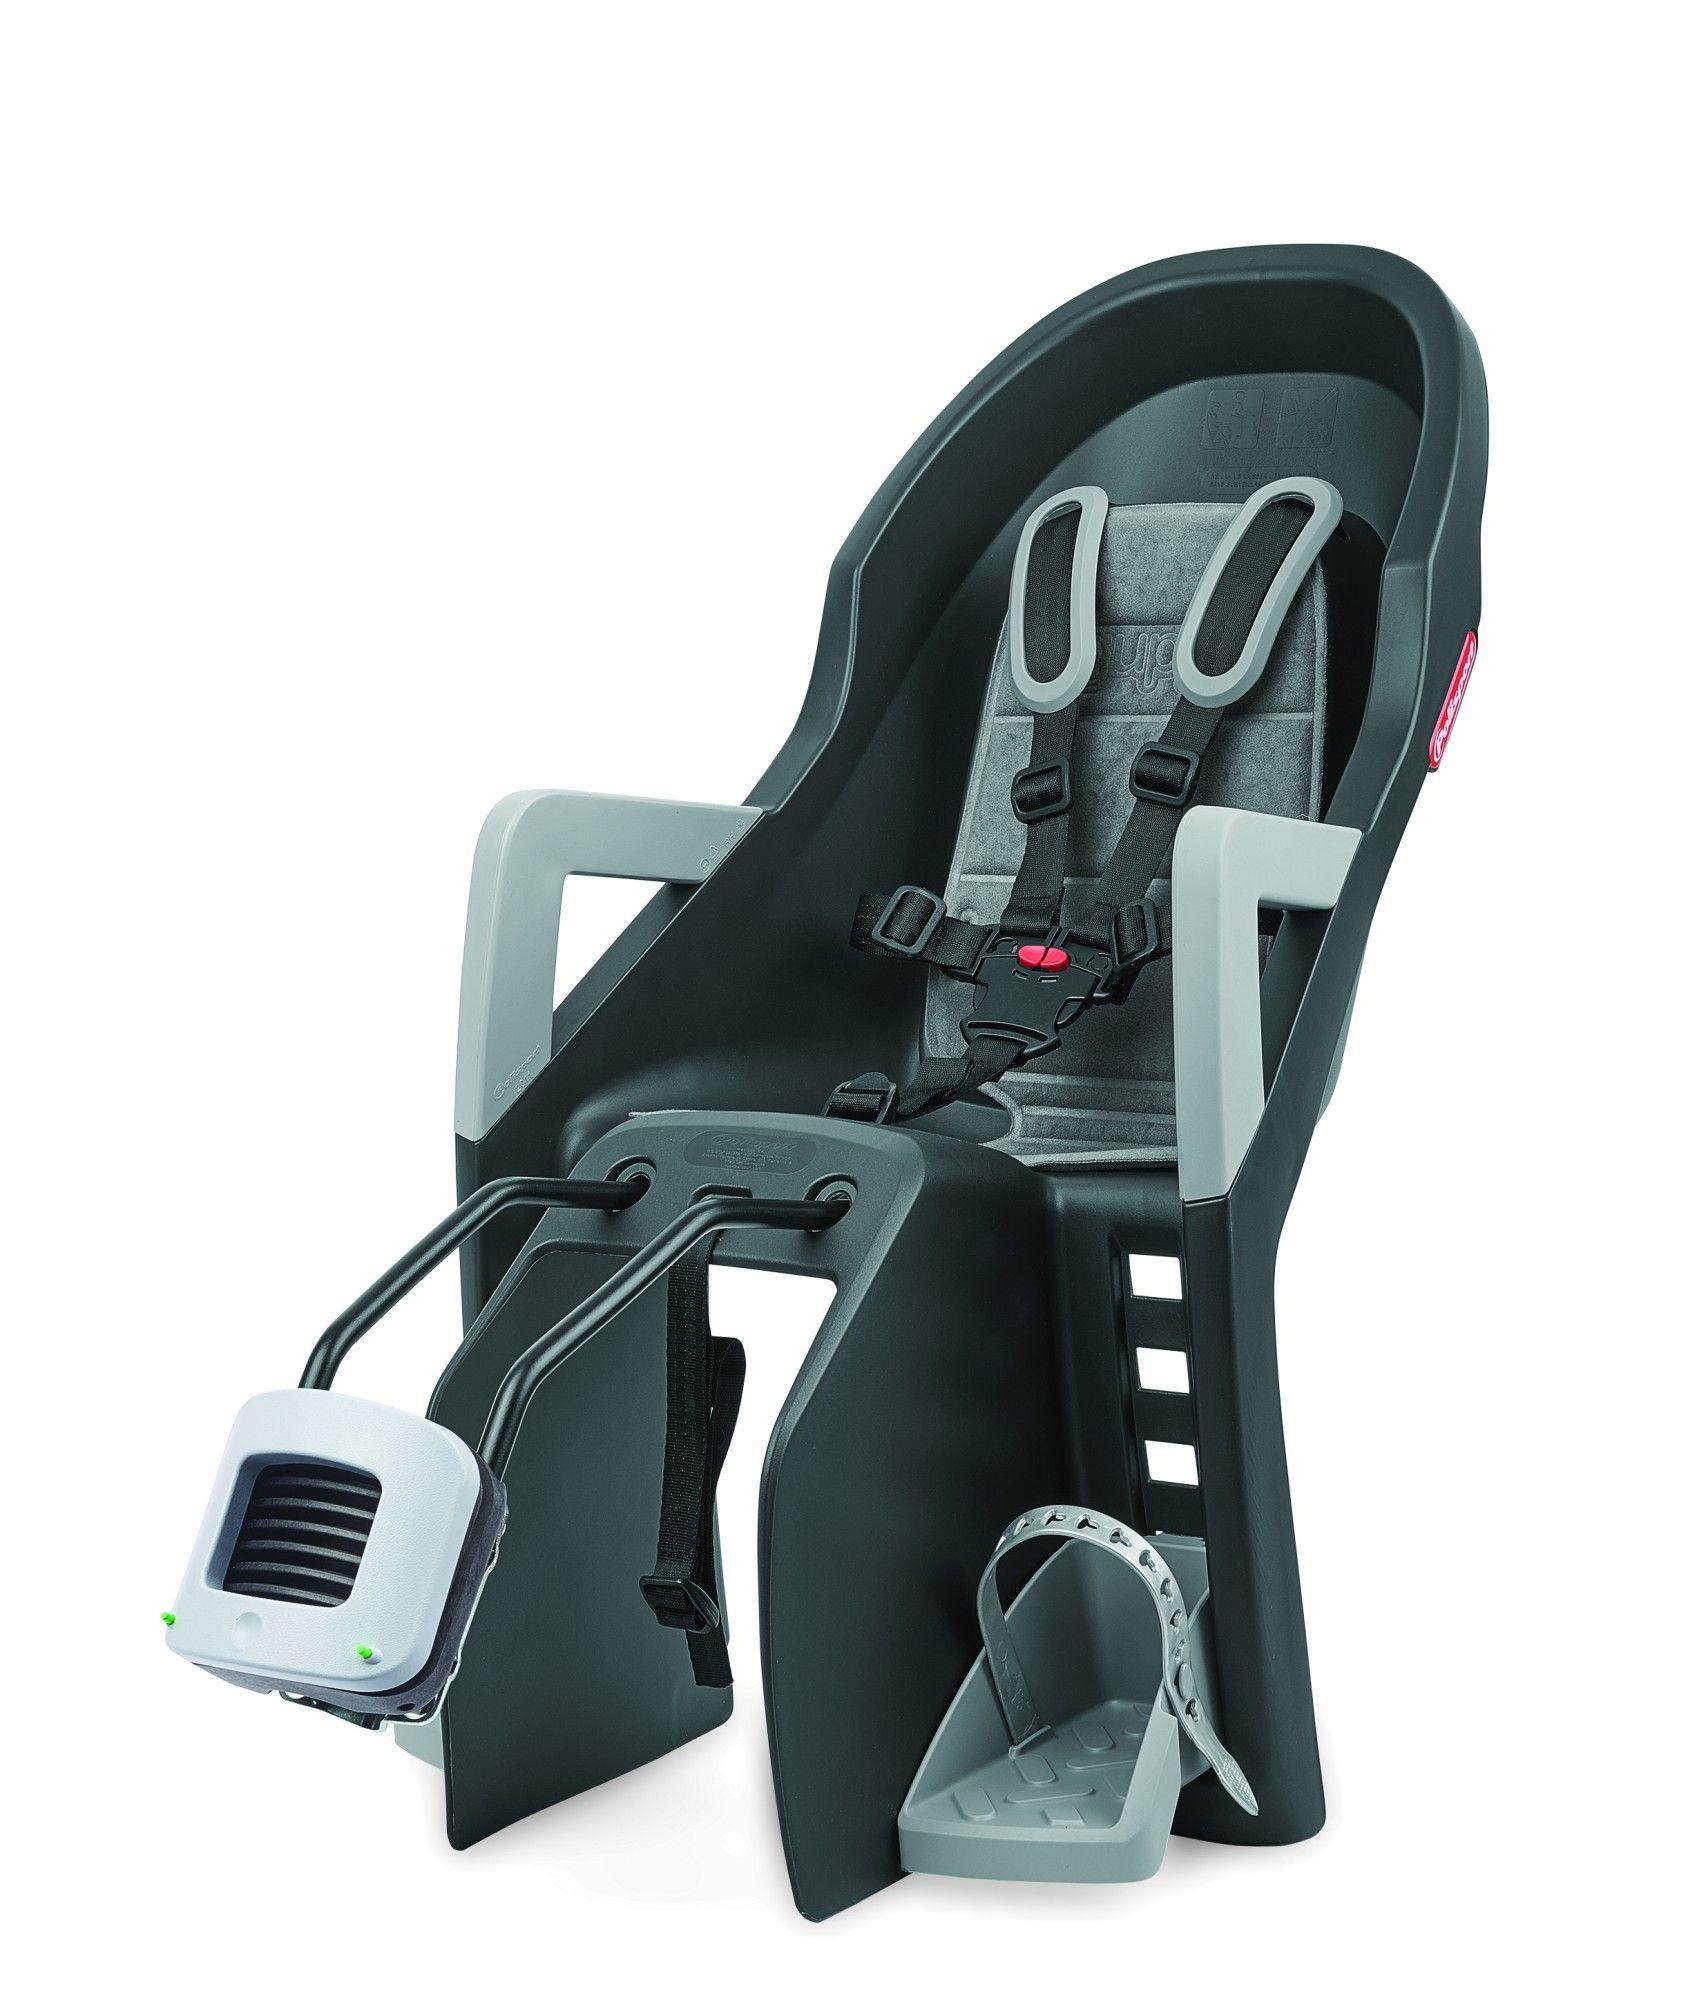 Polisport Kindersitz Guppy Maxi, grau